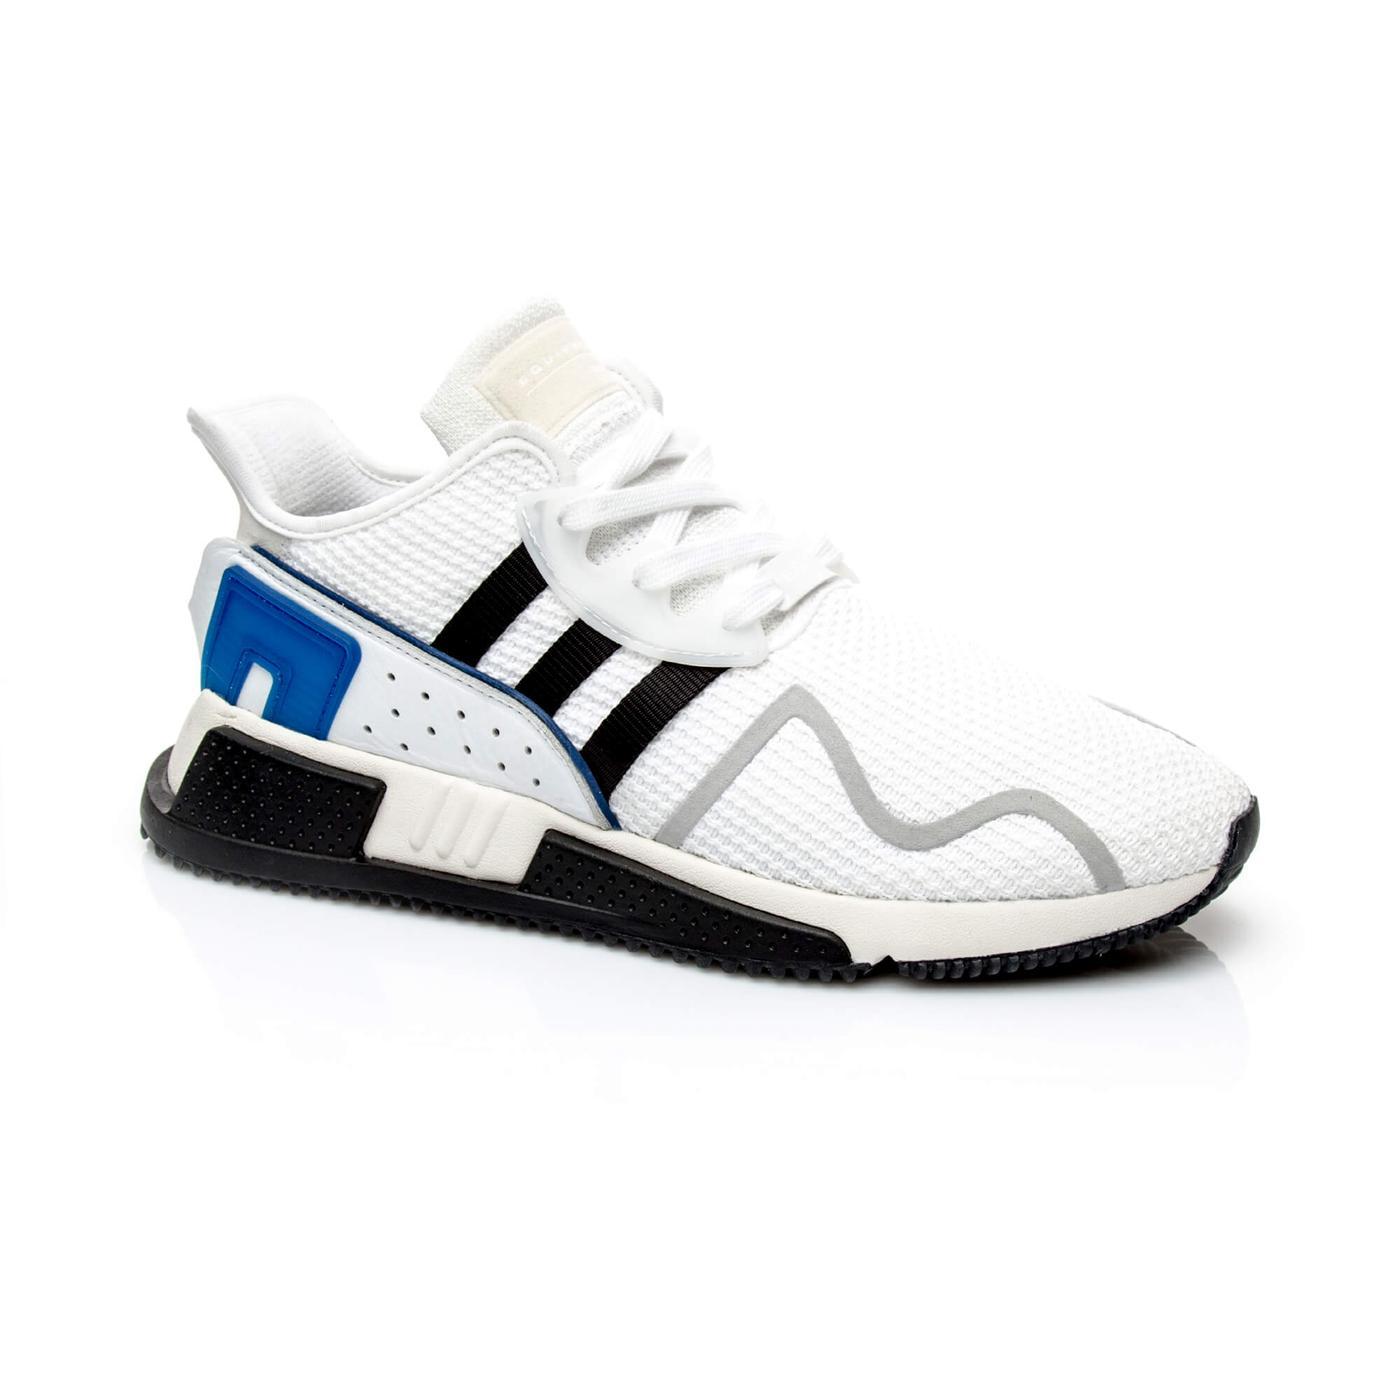 adidas EQT Support ADV Erkek Beyaz Spor Ayakkabı